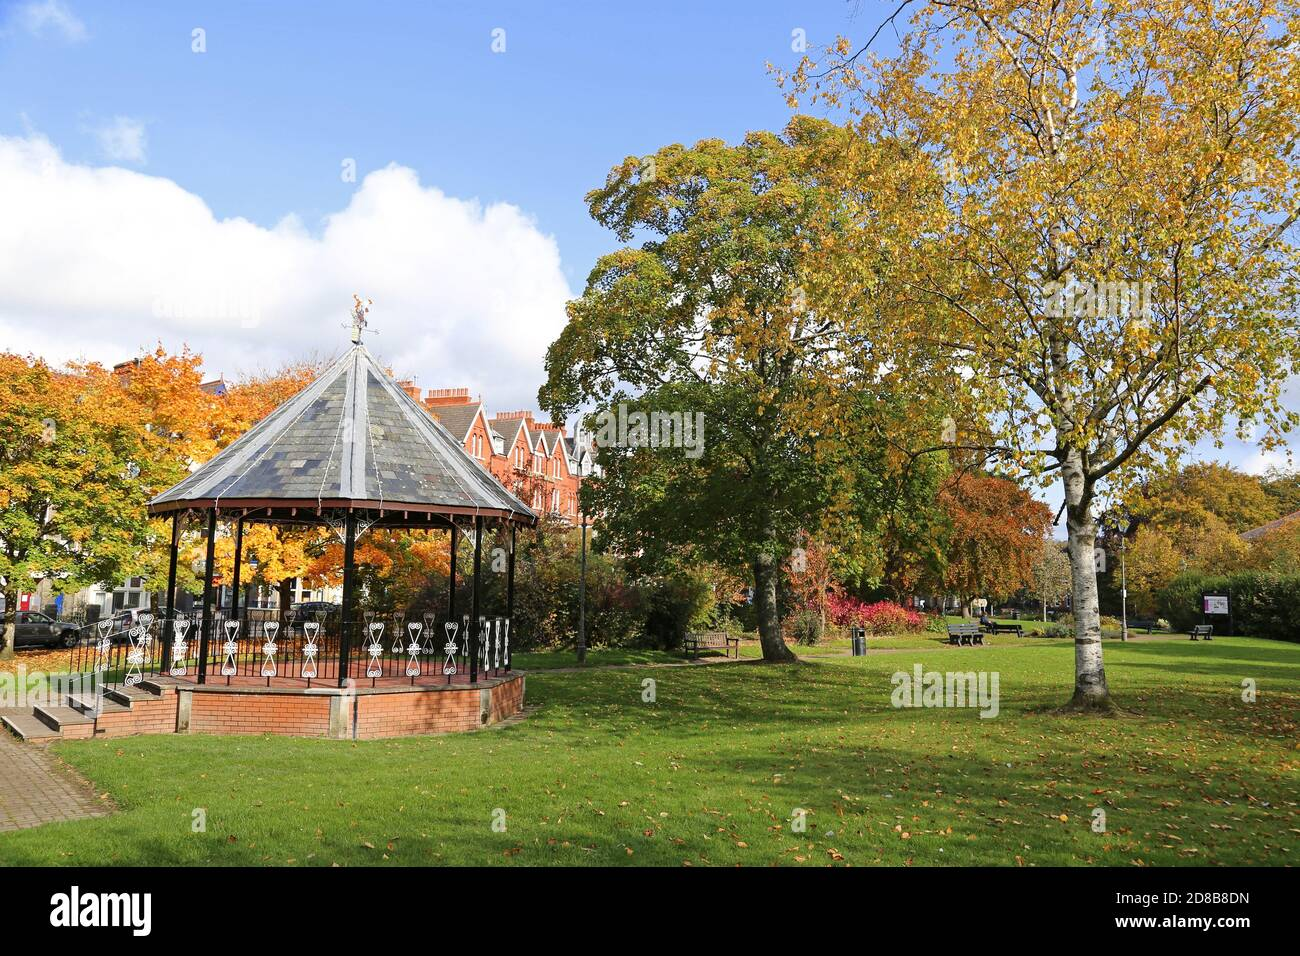 Temple Gardens, Spa Road, Llandrindod Wells, Radnorshire, Powys, pays de Galles, Grande-Bretagne, Royaume-Uni, Royaume-Uni, Europe Banque D'Images